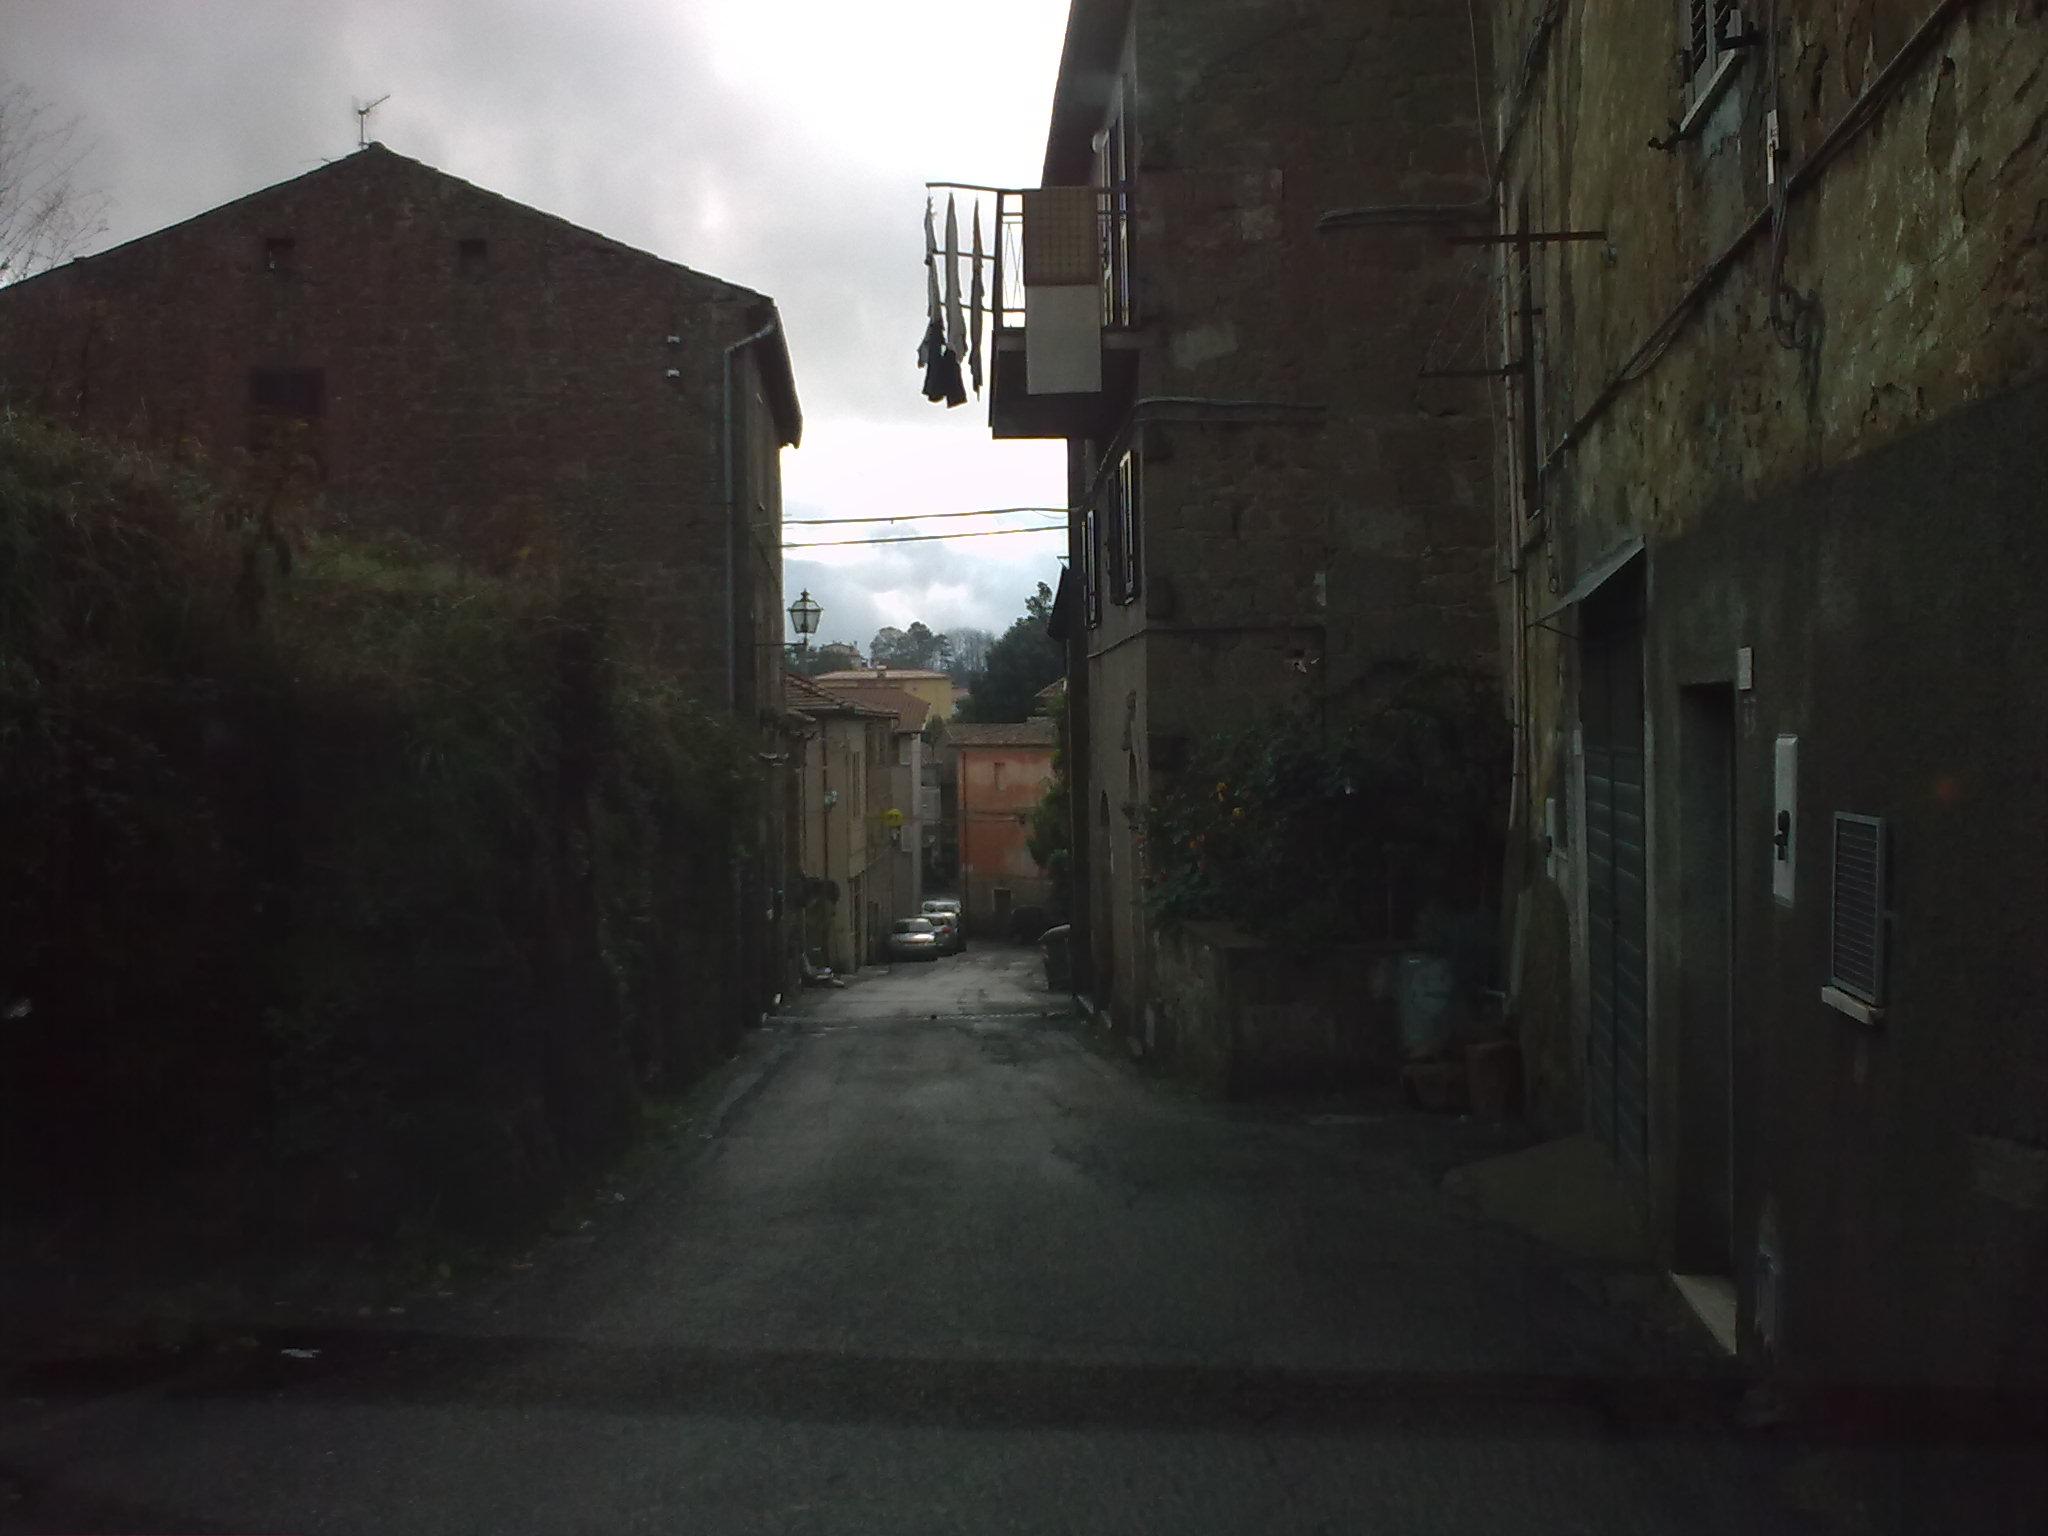 San Quirico, Vitozza e dintorni